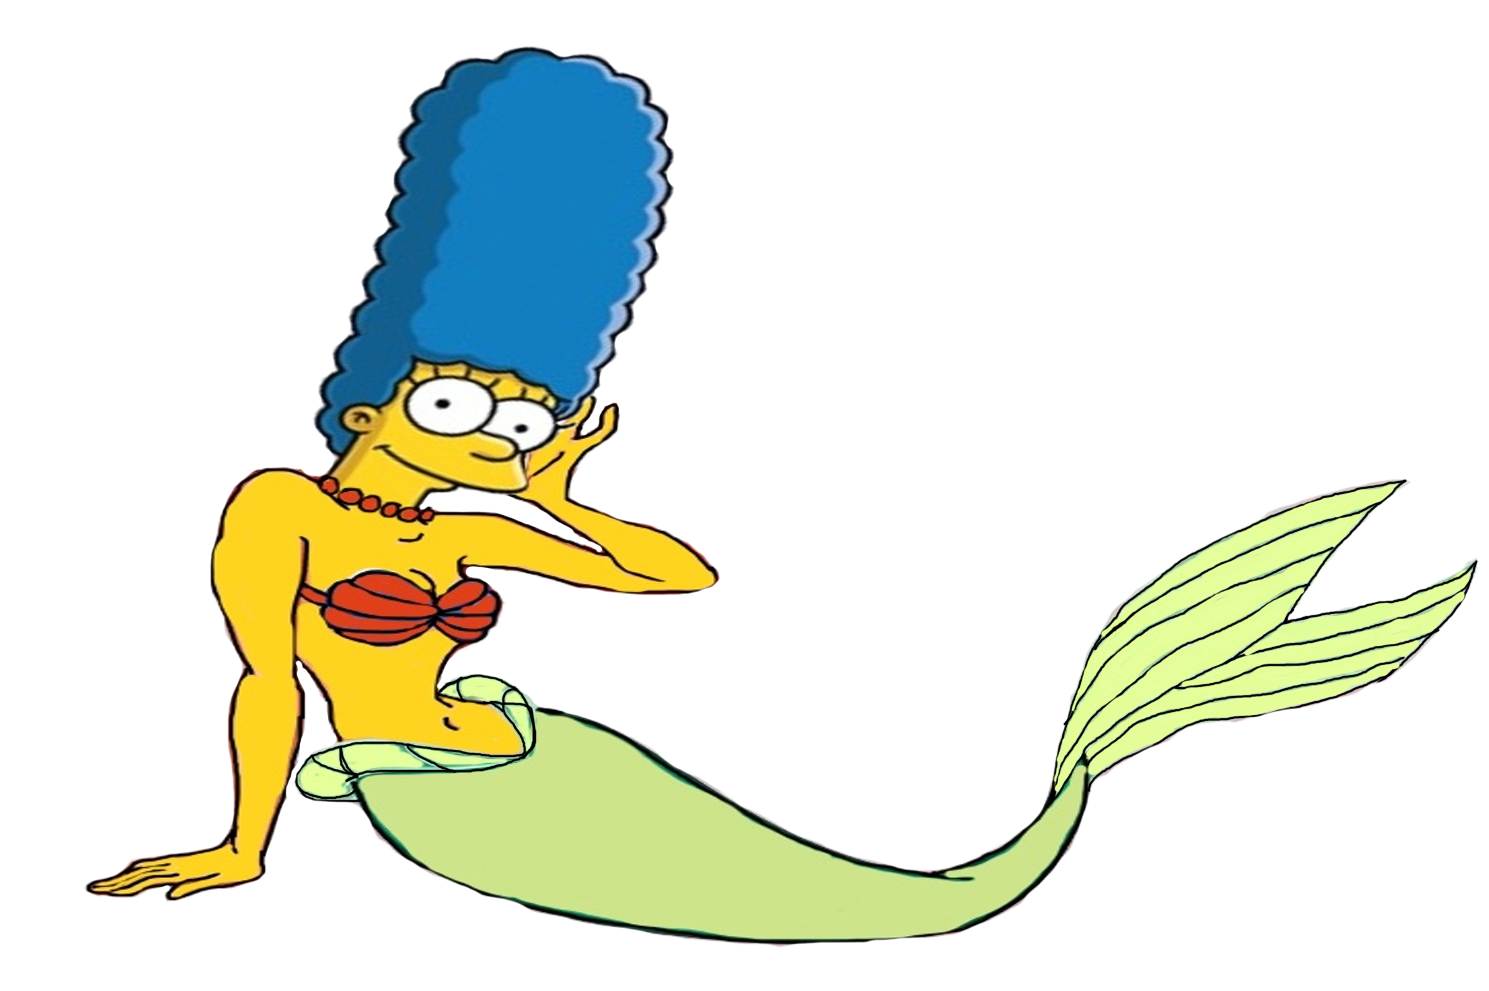 1489x991 Marge Simpson As A Mermaid By Darthranner83